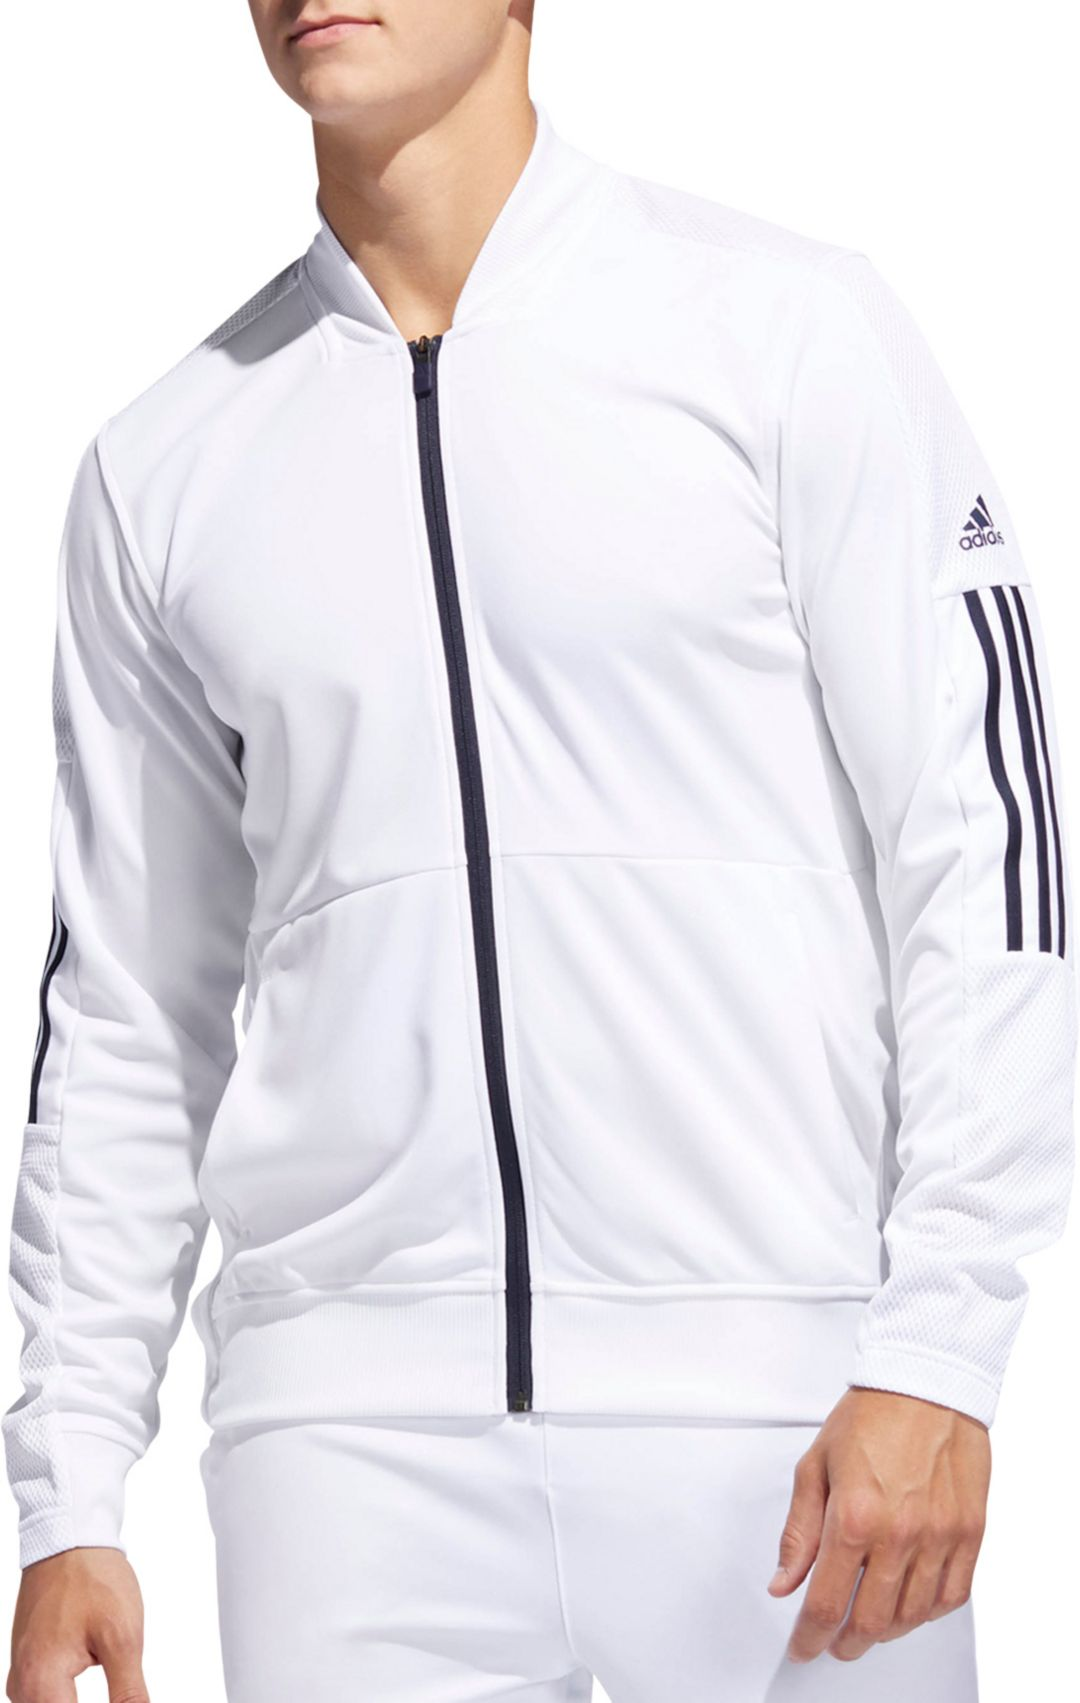 aea83707fa988 adidas Men's Side Snap Full-Zip Track Jacket